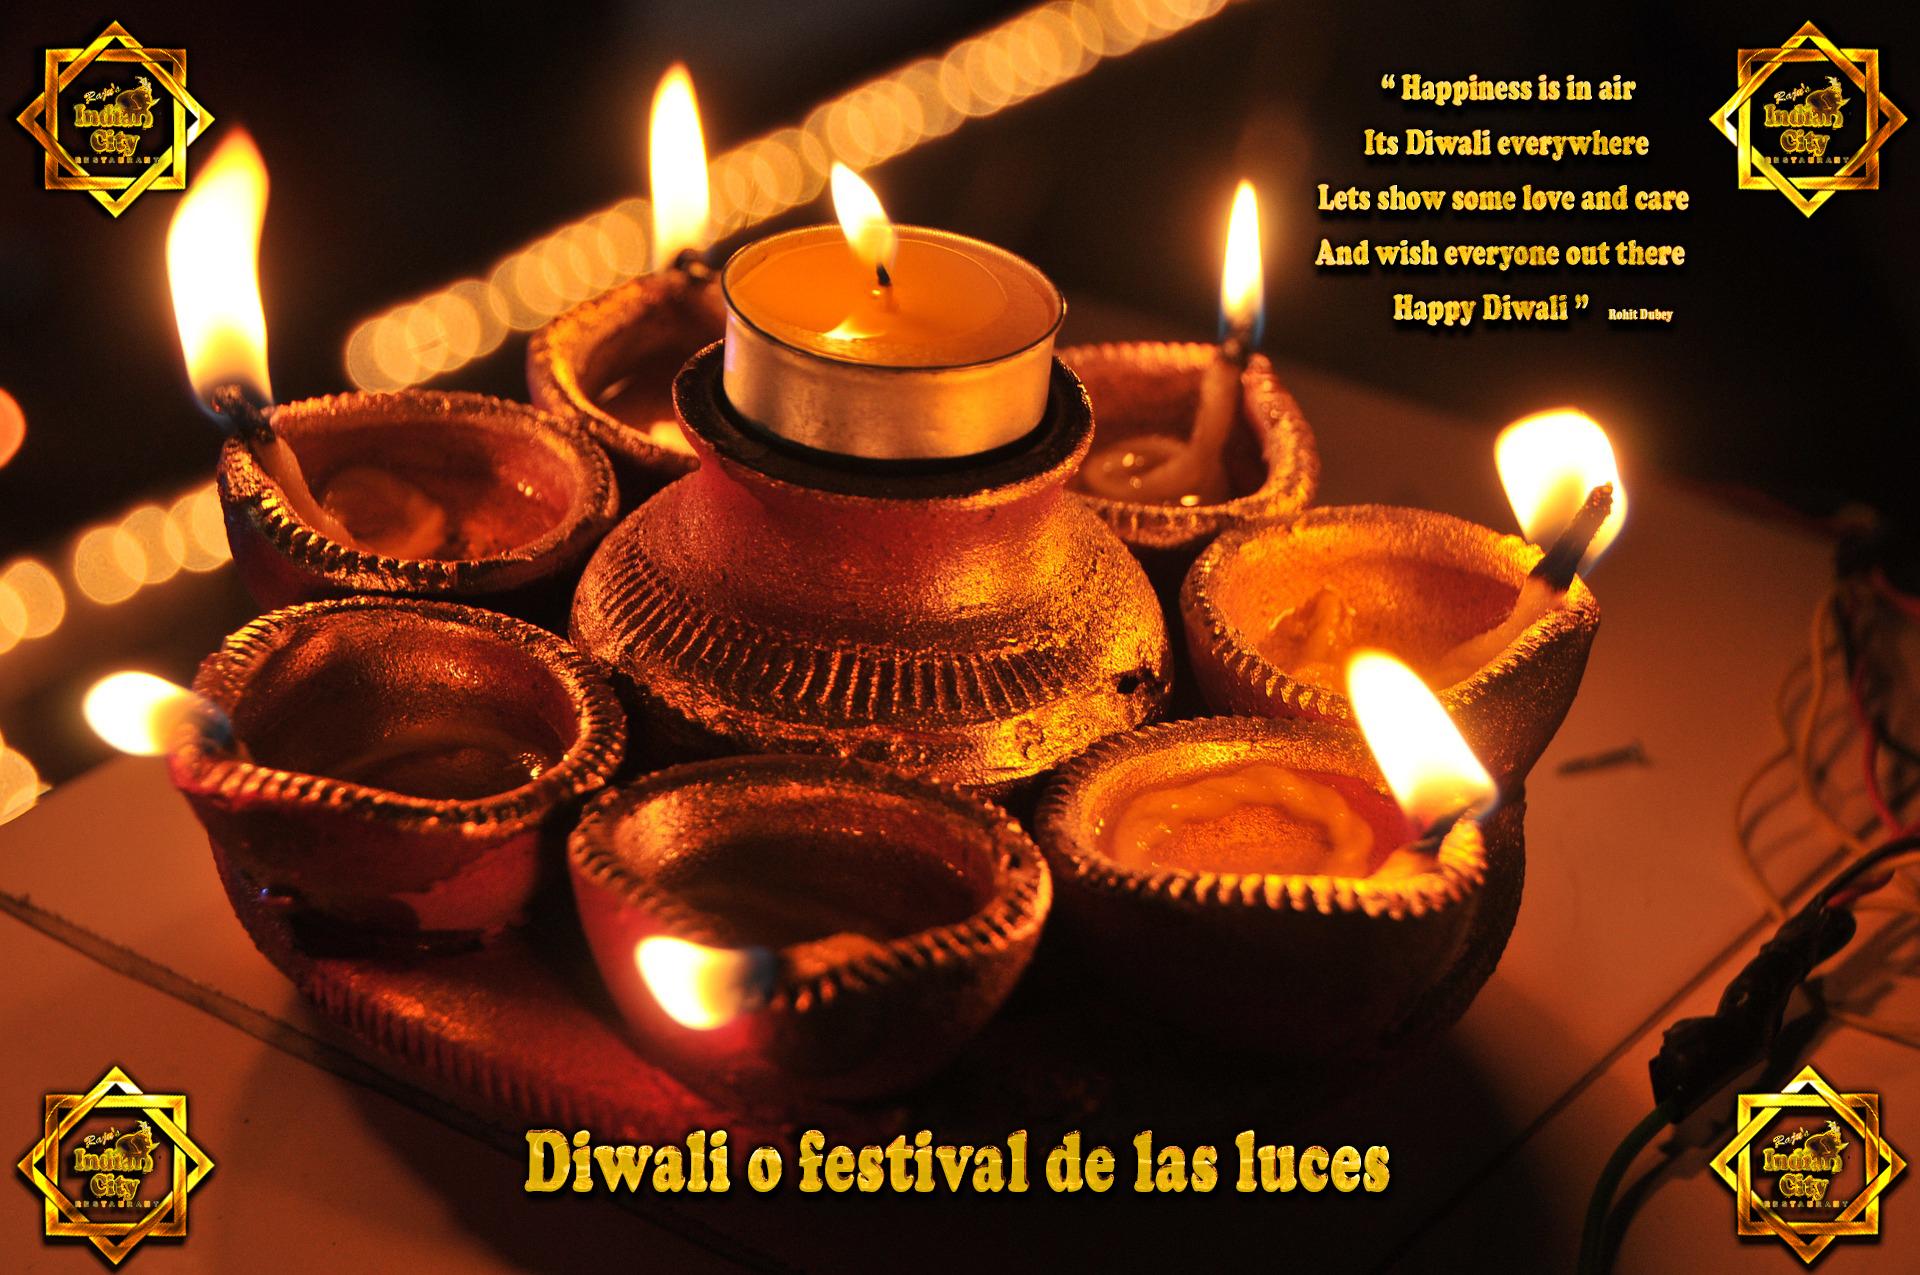 Diwali o festival de las luces